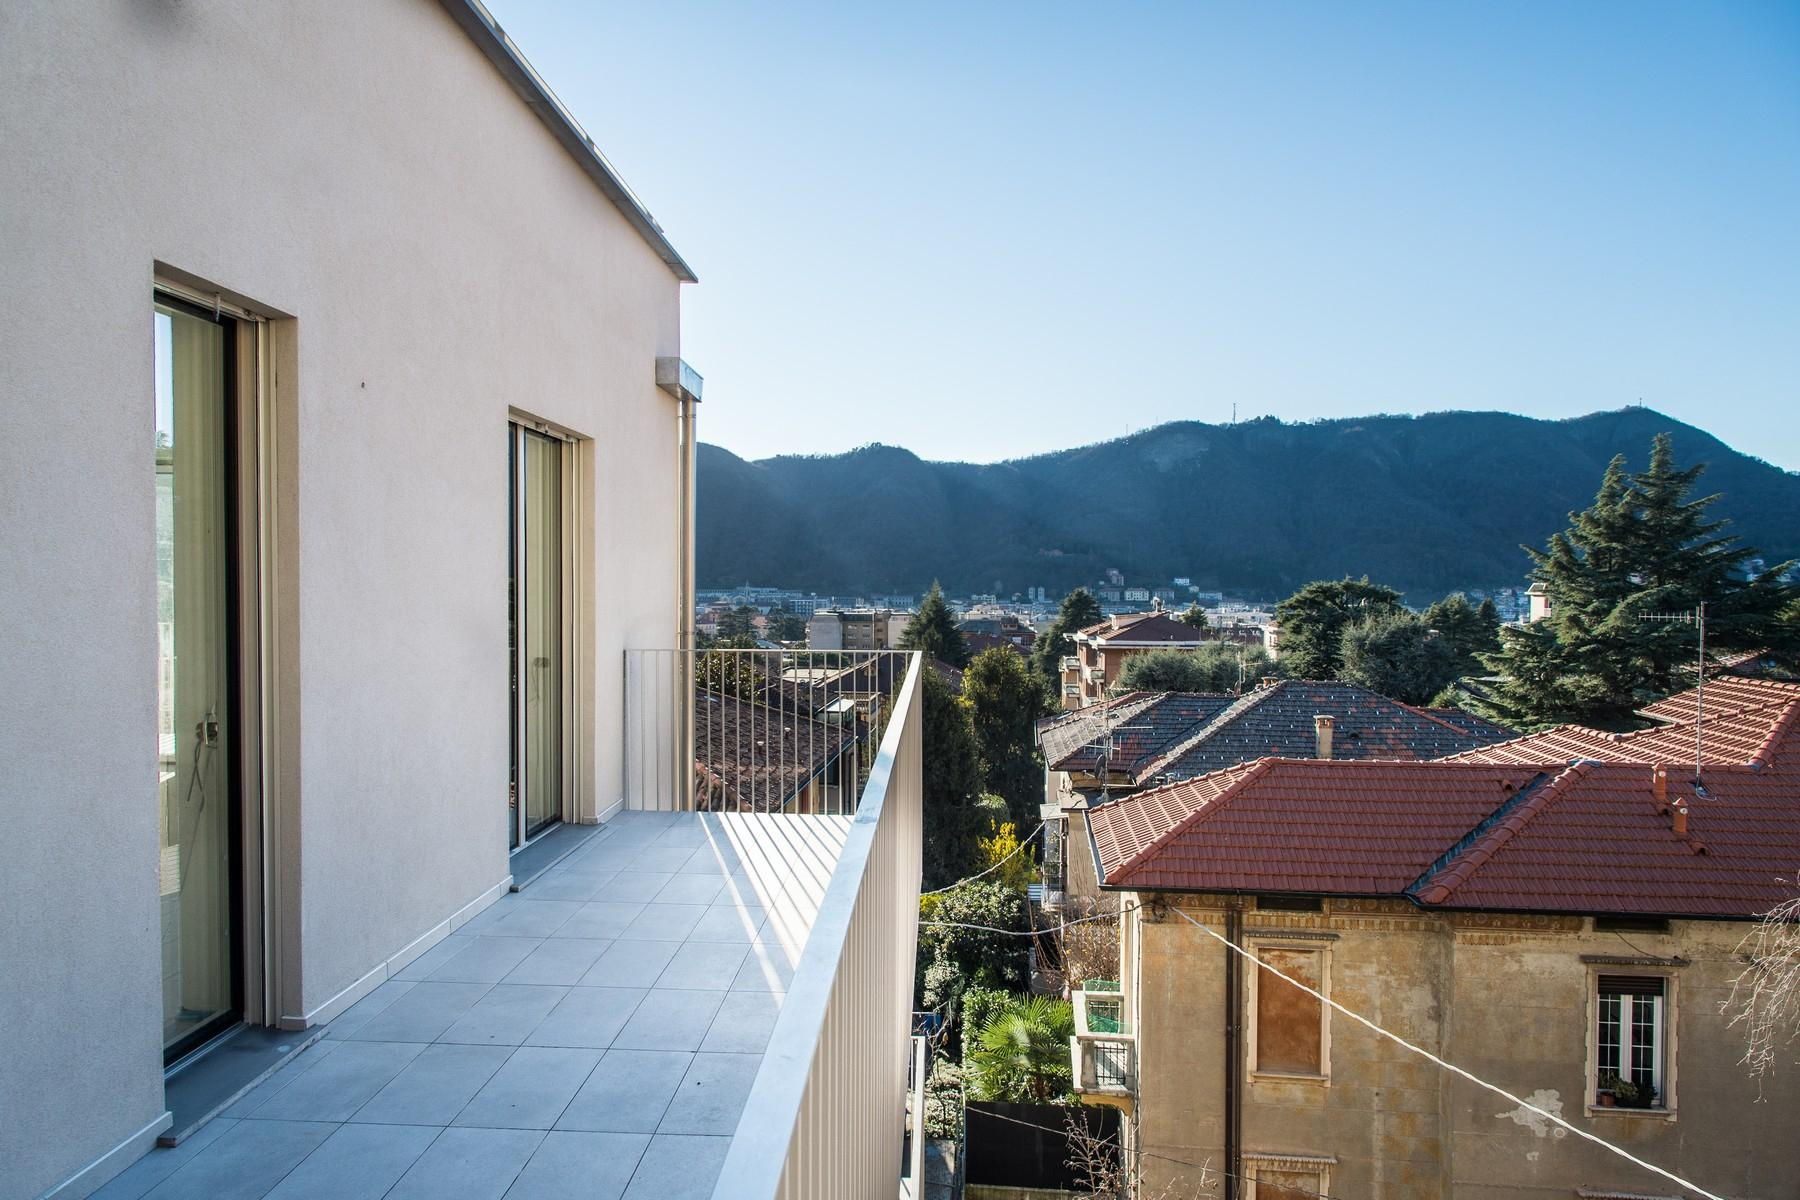 Exclusif appartement neuf en position panoramique - 10